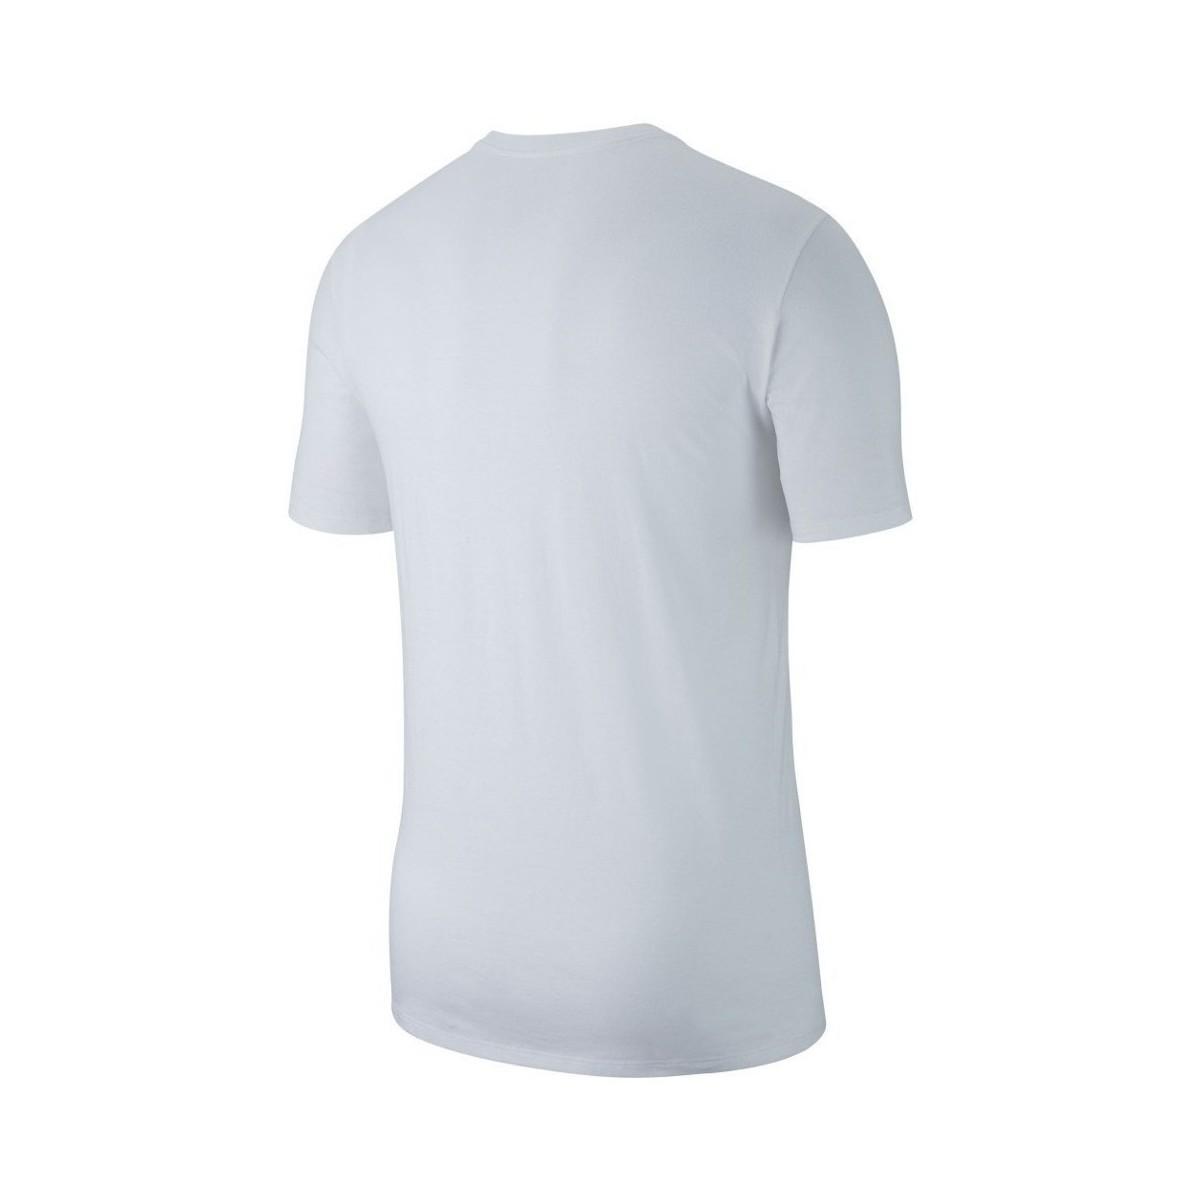 260203f130bcb6 Nike - Air Jordan Jumpman Embroidered Tee Men s T Shirt In White for Men -  Lyst. View fullscreen